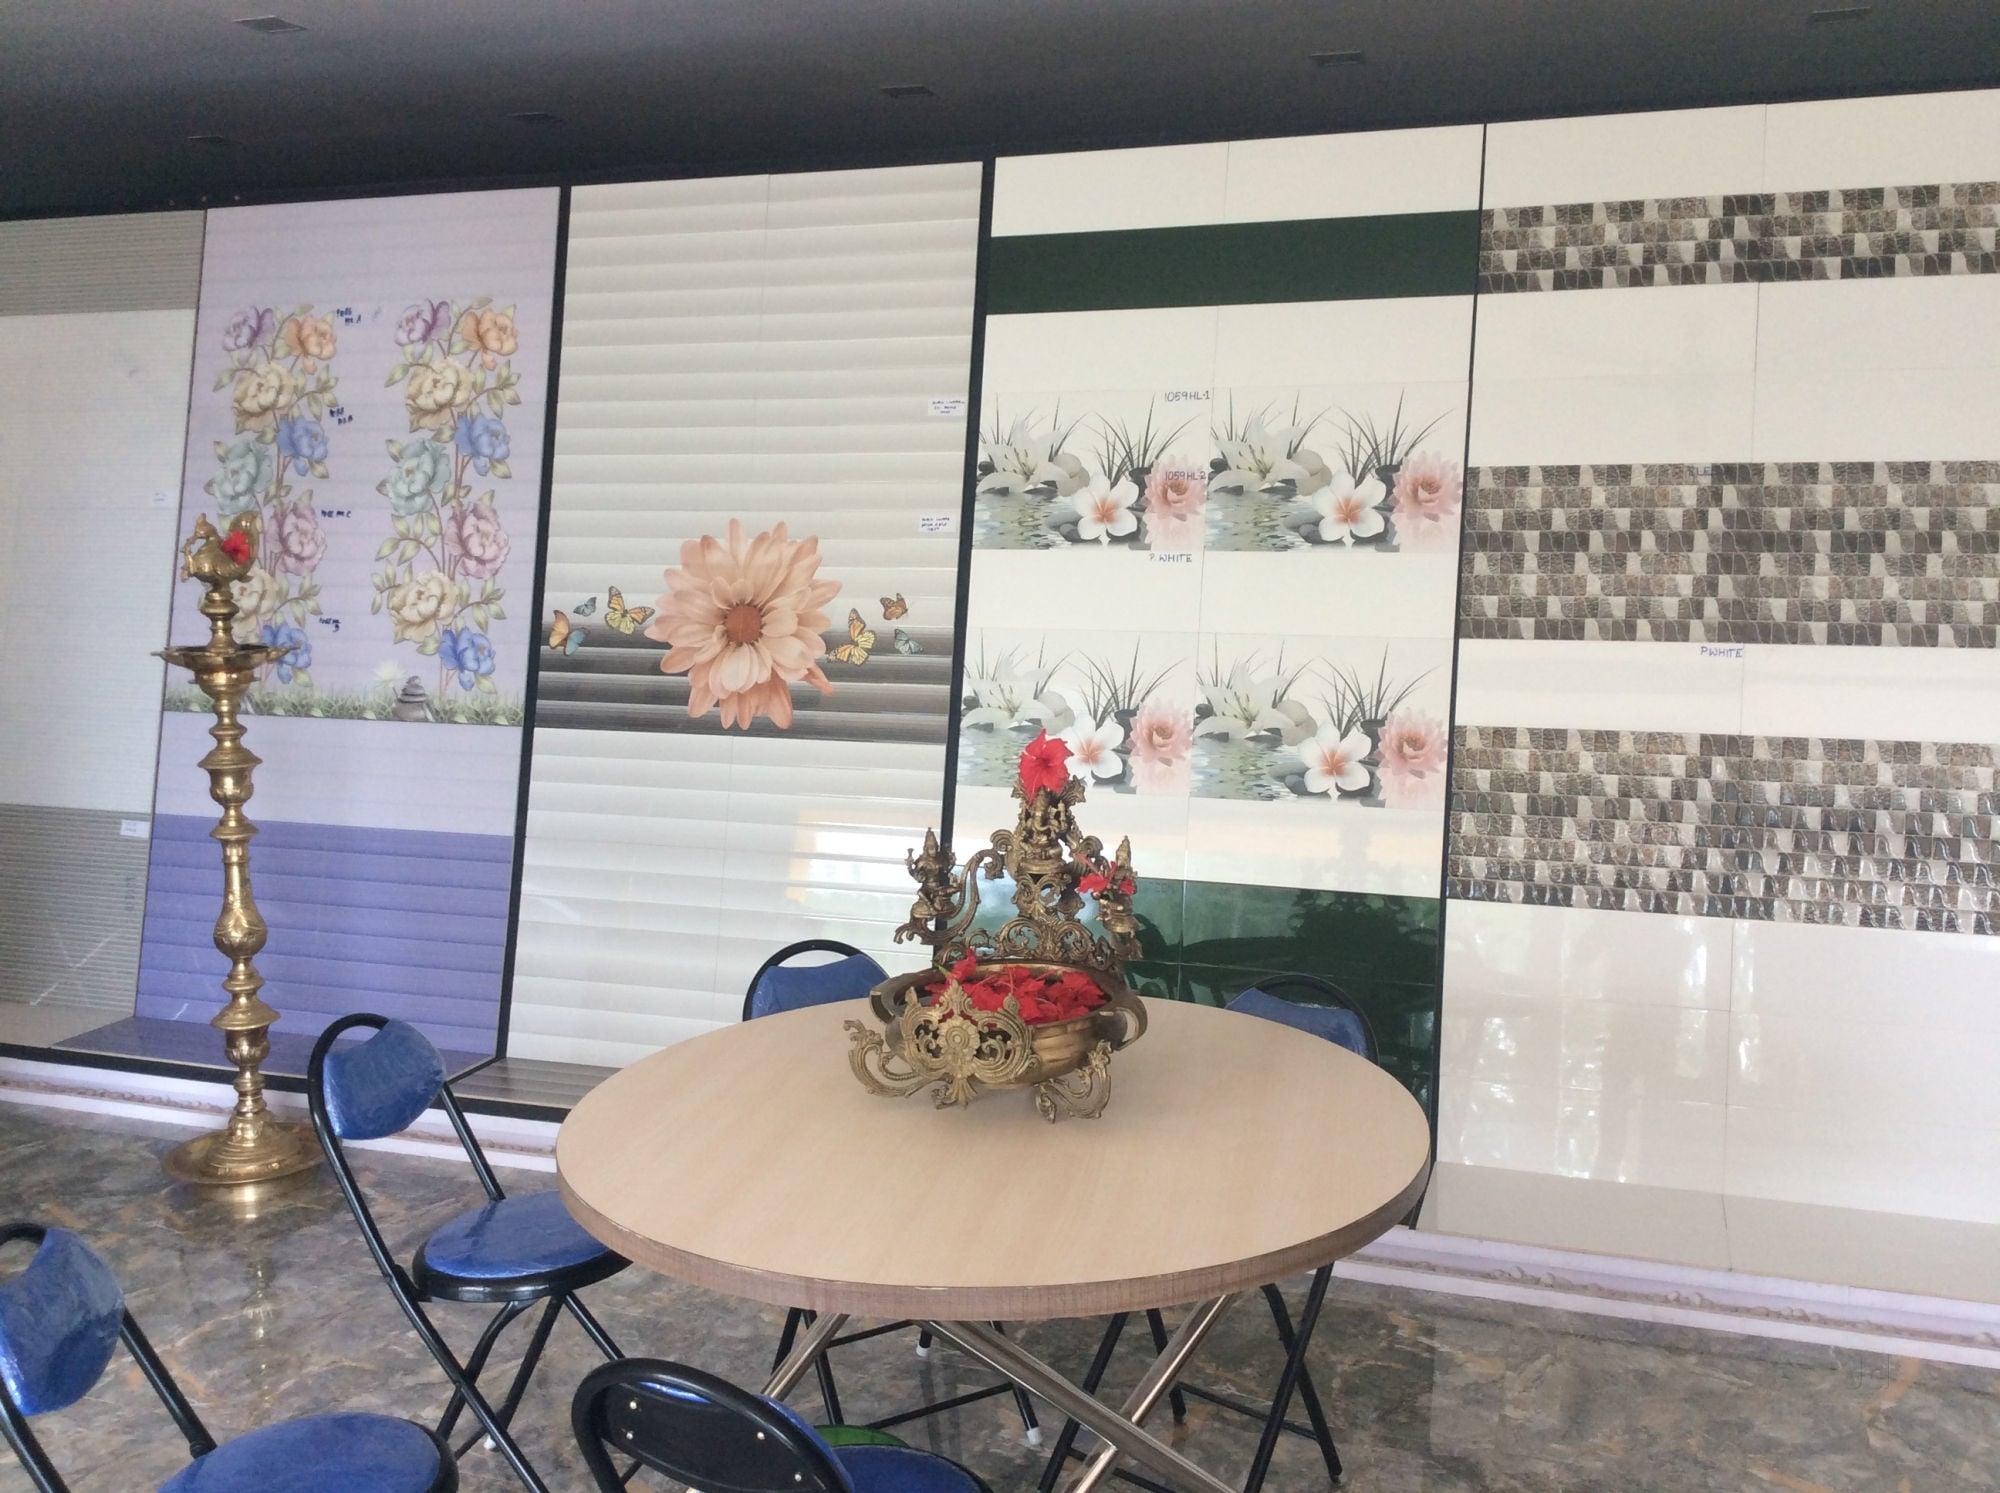 Top Ceramic Tile Dealers In Dharmapuri Justdial - Ceramic tile dealers near me